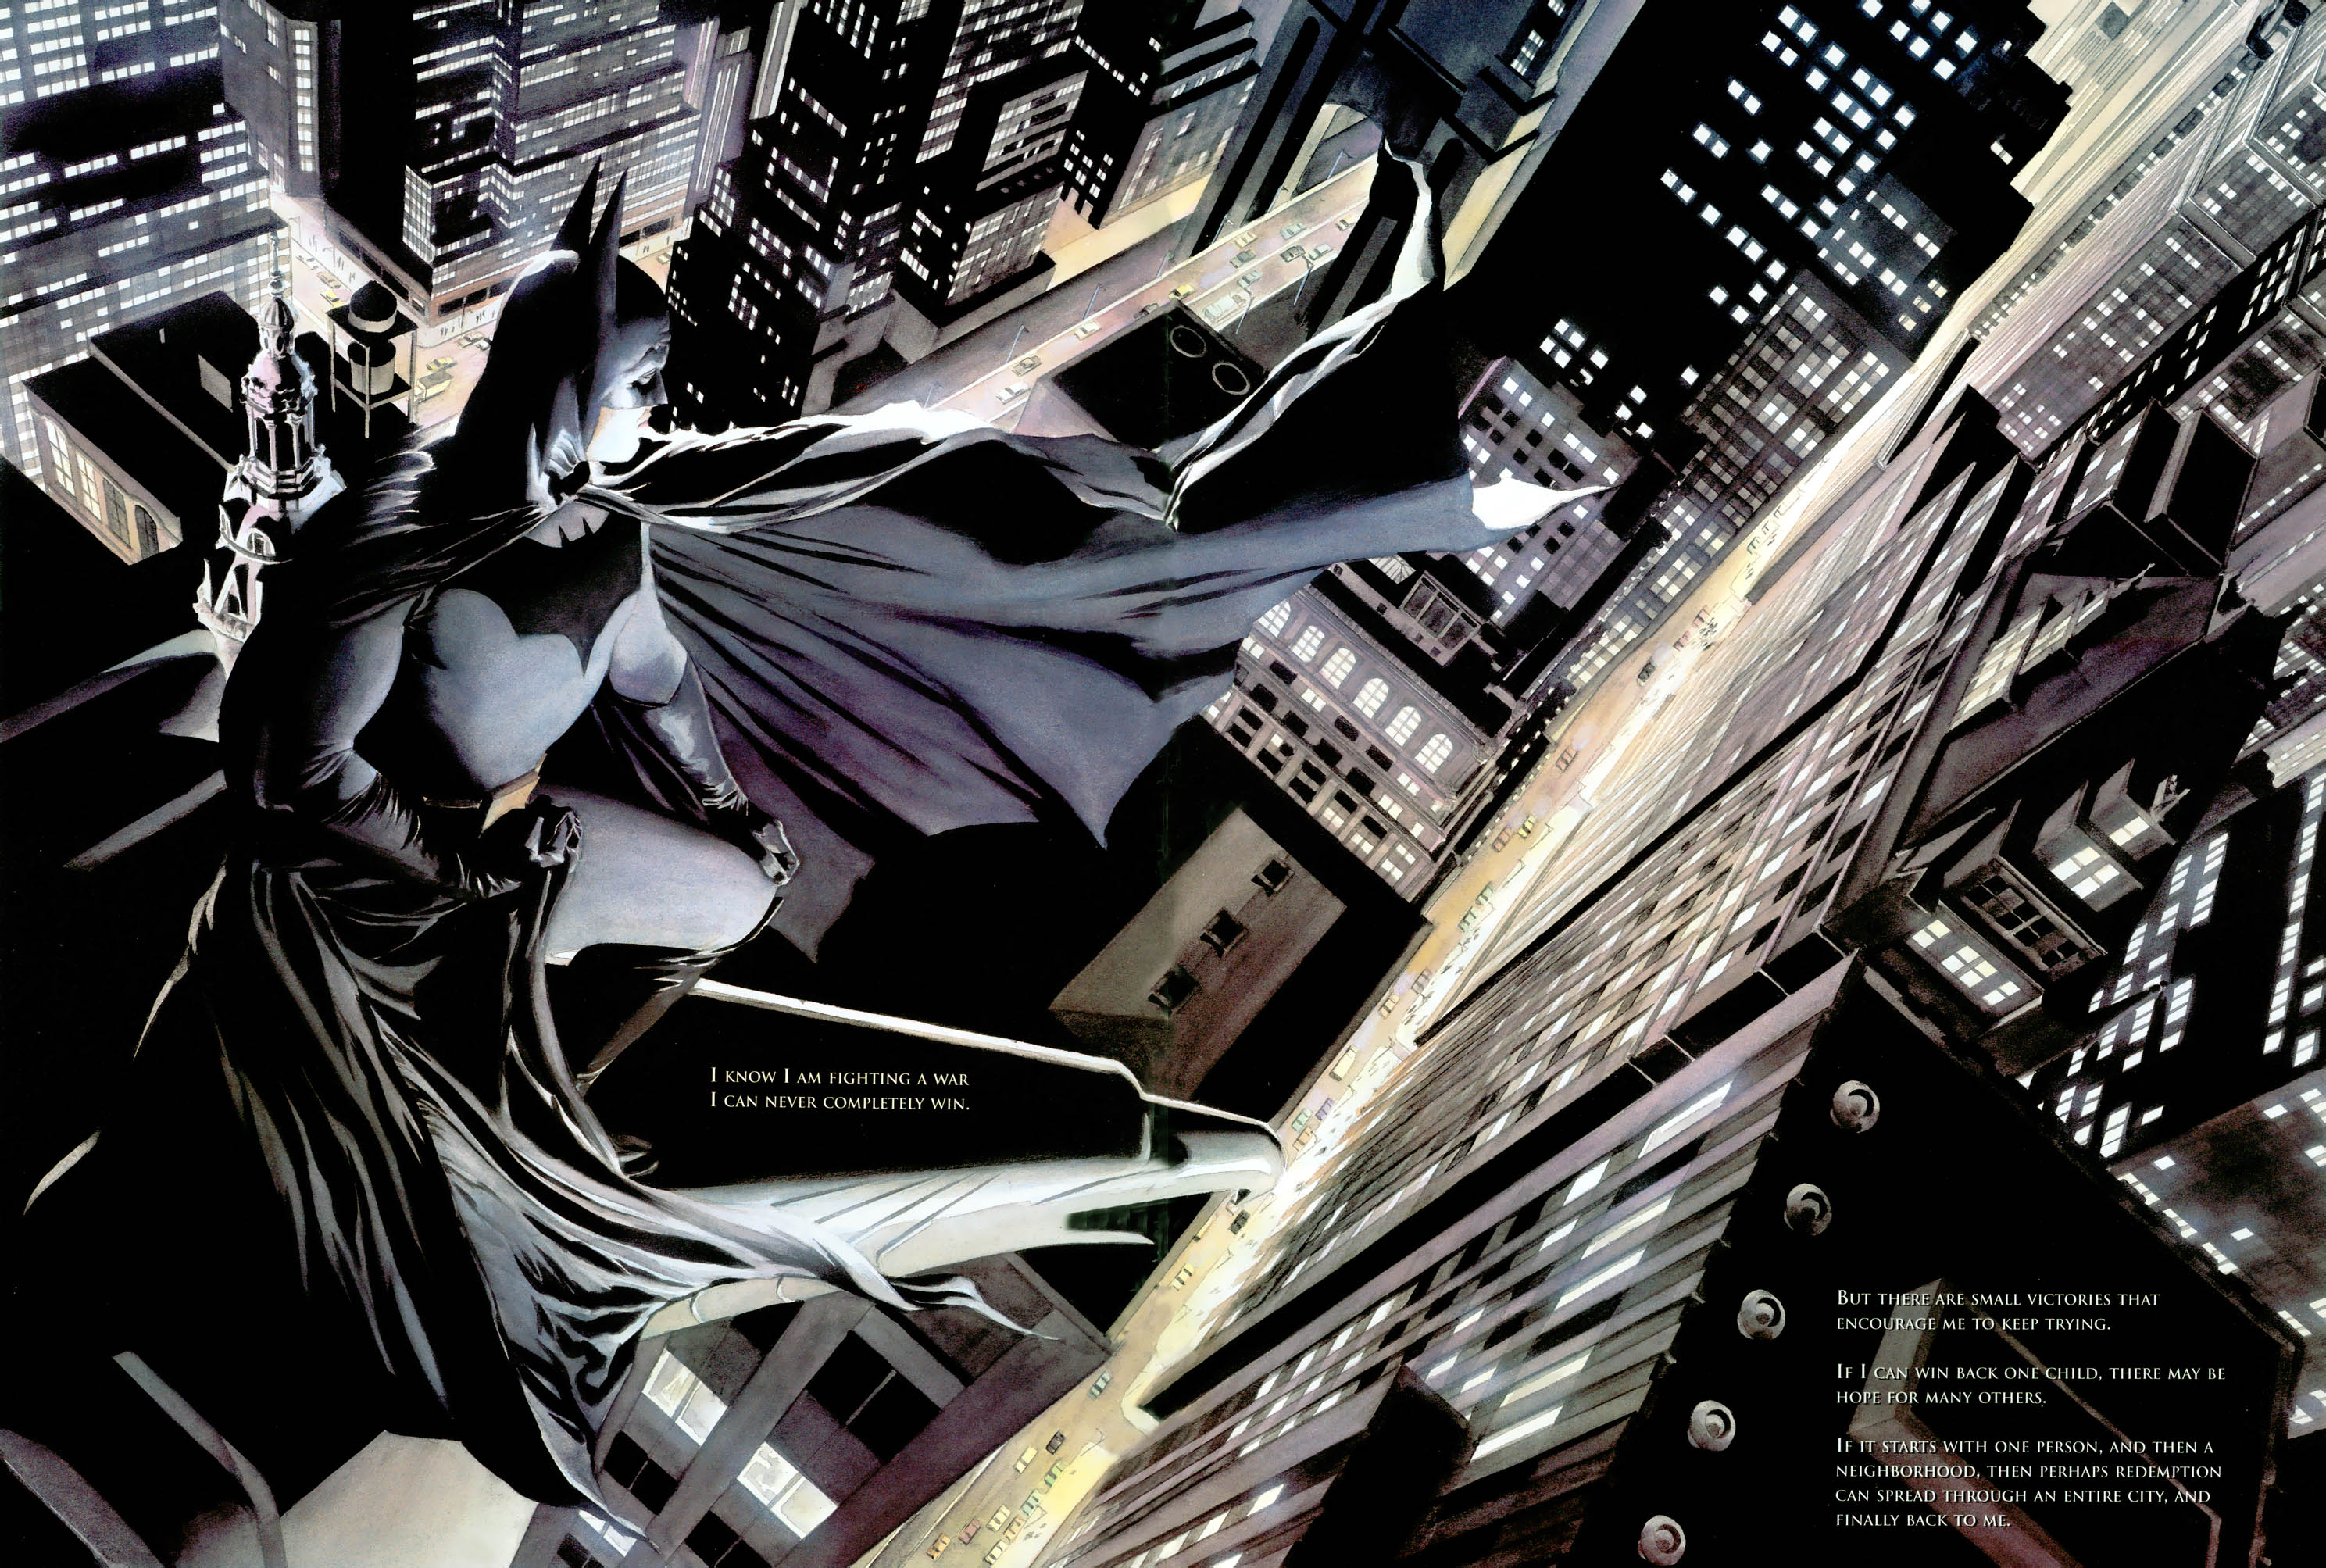 Psychology of Bruce Wayne RCO090